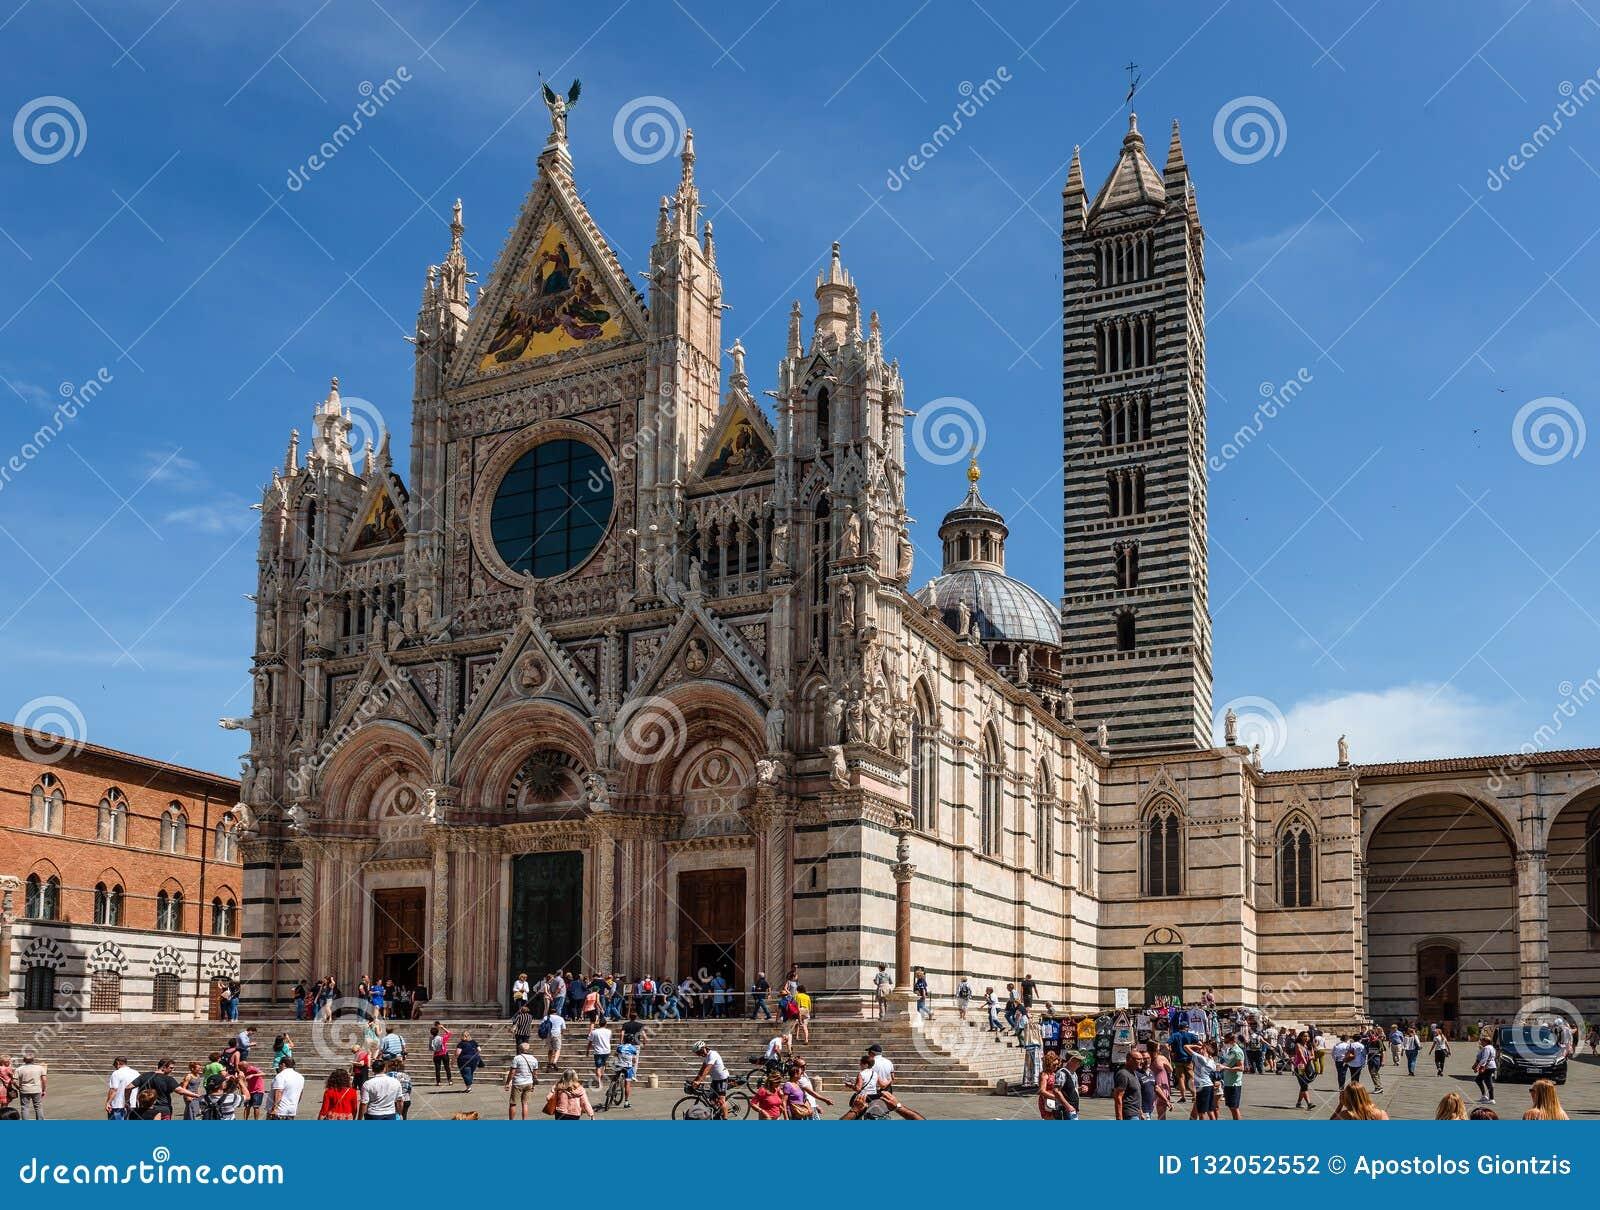 De siena kathedraal